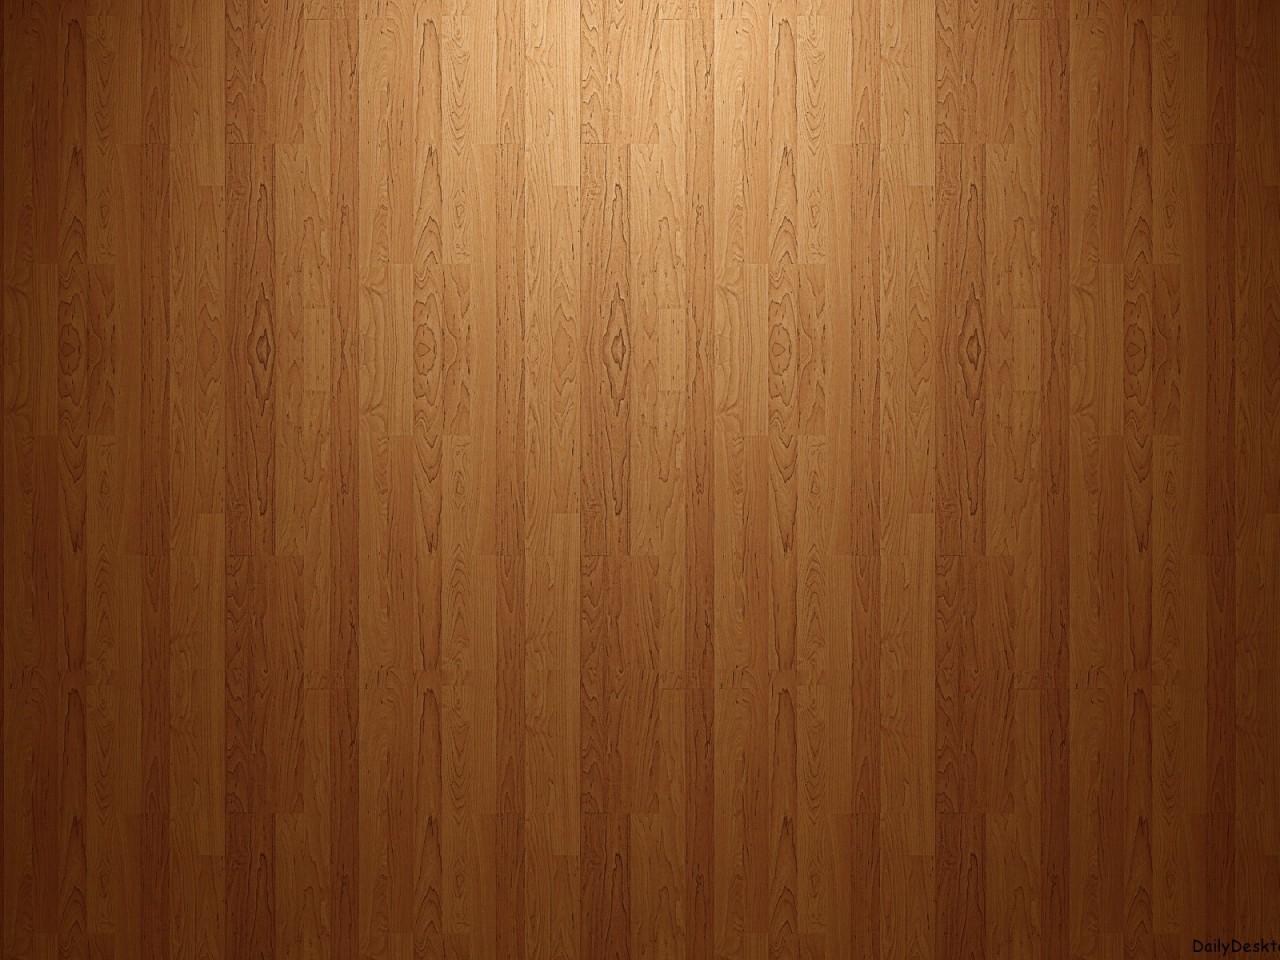 Wood panels hd wallpapers